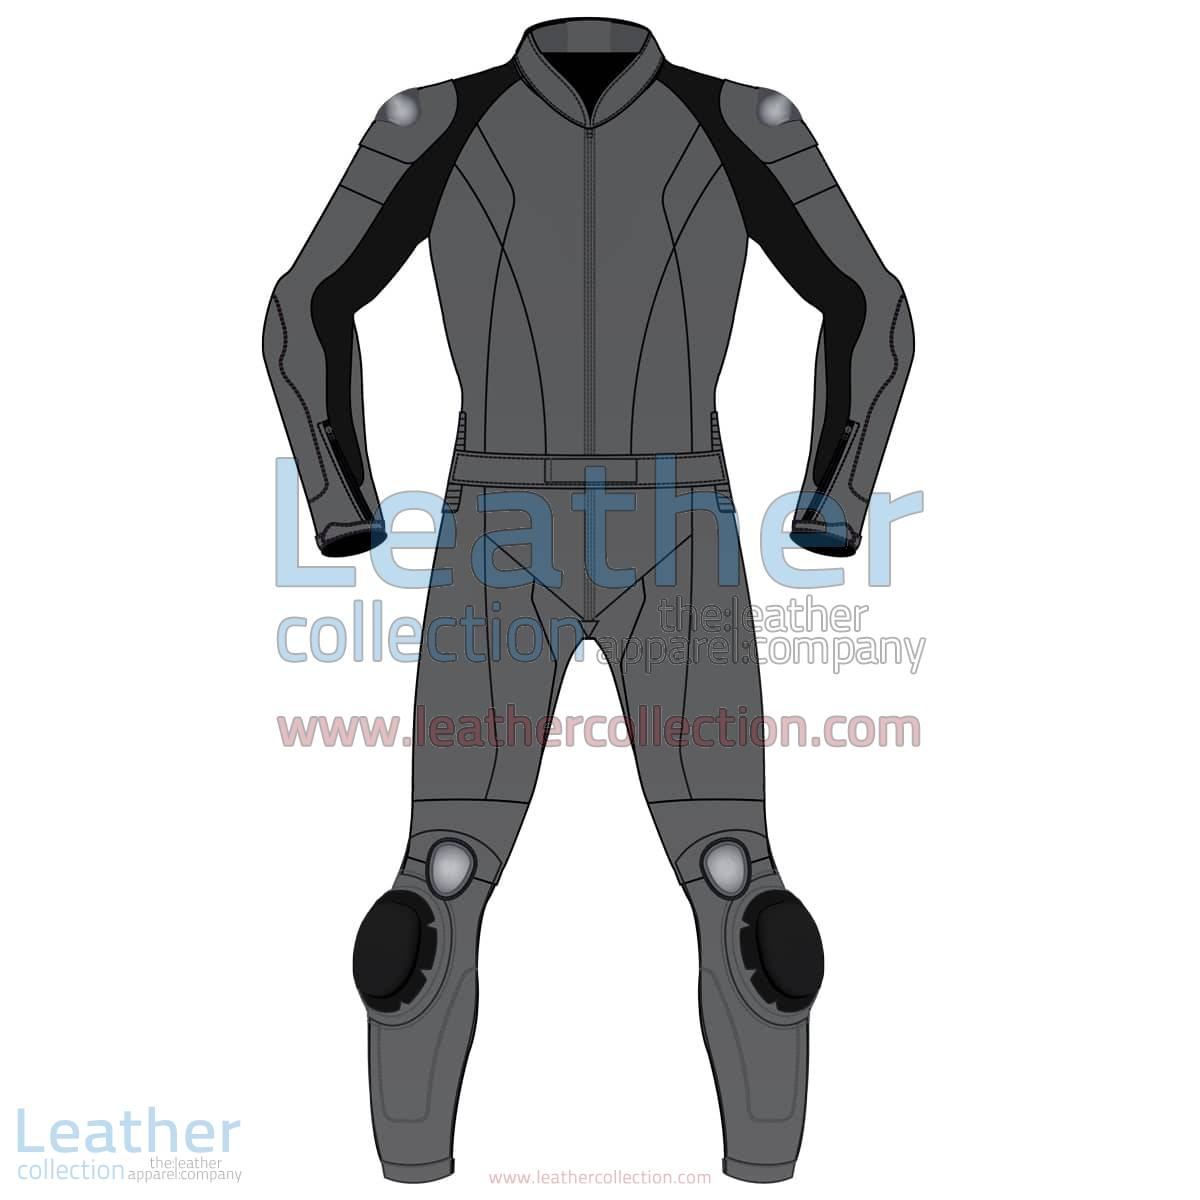 Uni Color Two-Piece Motorbike Leather Suit For Men | Uni Color Two-Piece motorcycle Leather Suit For Men